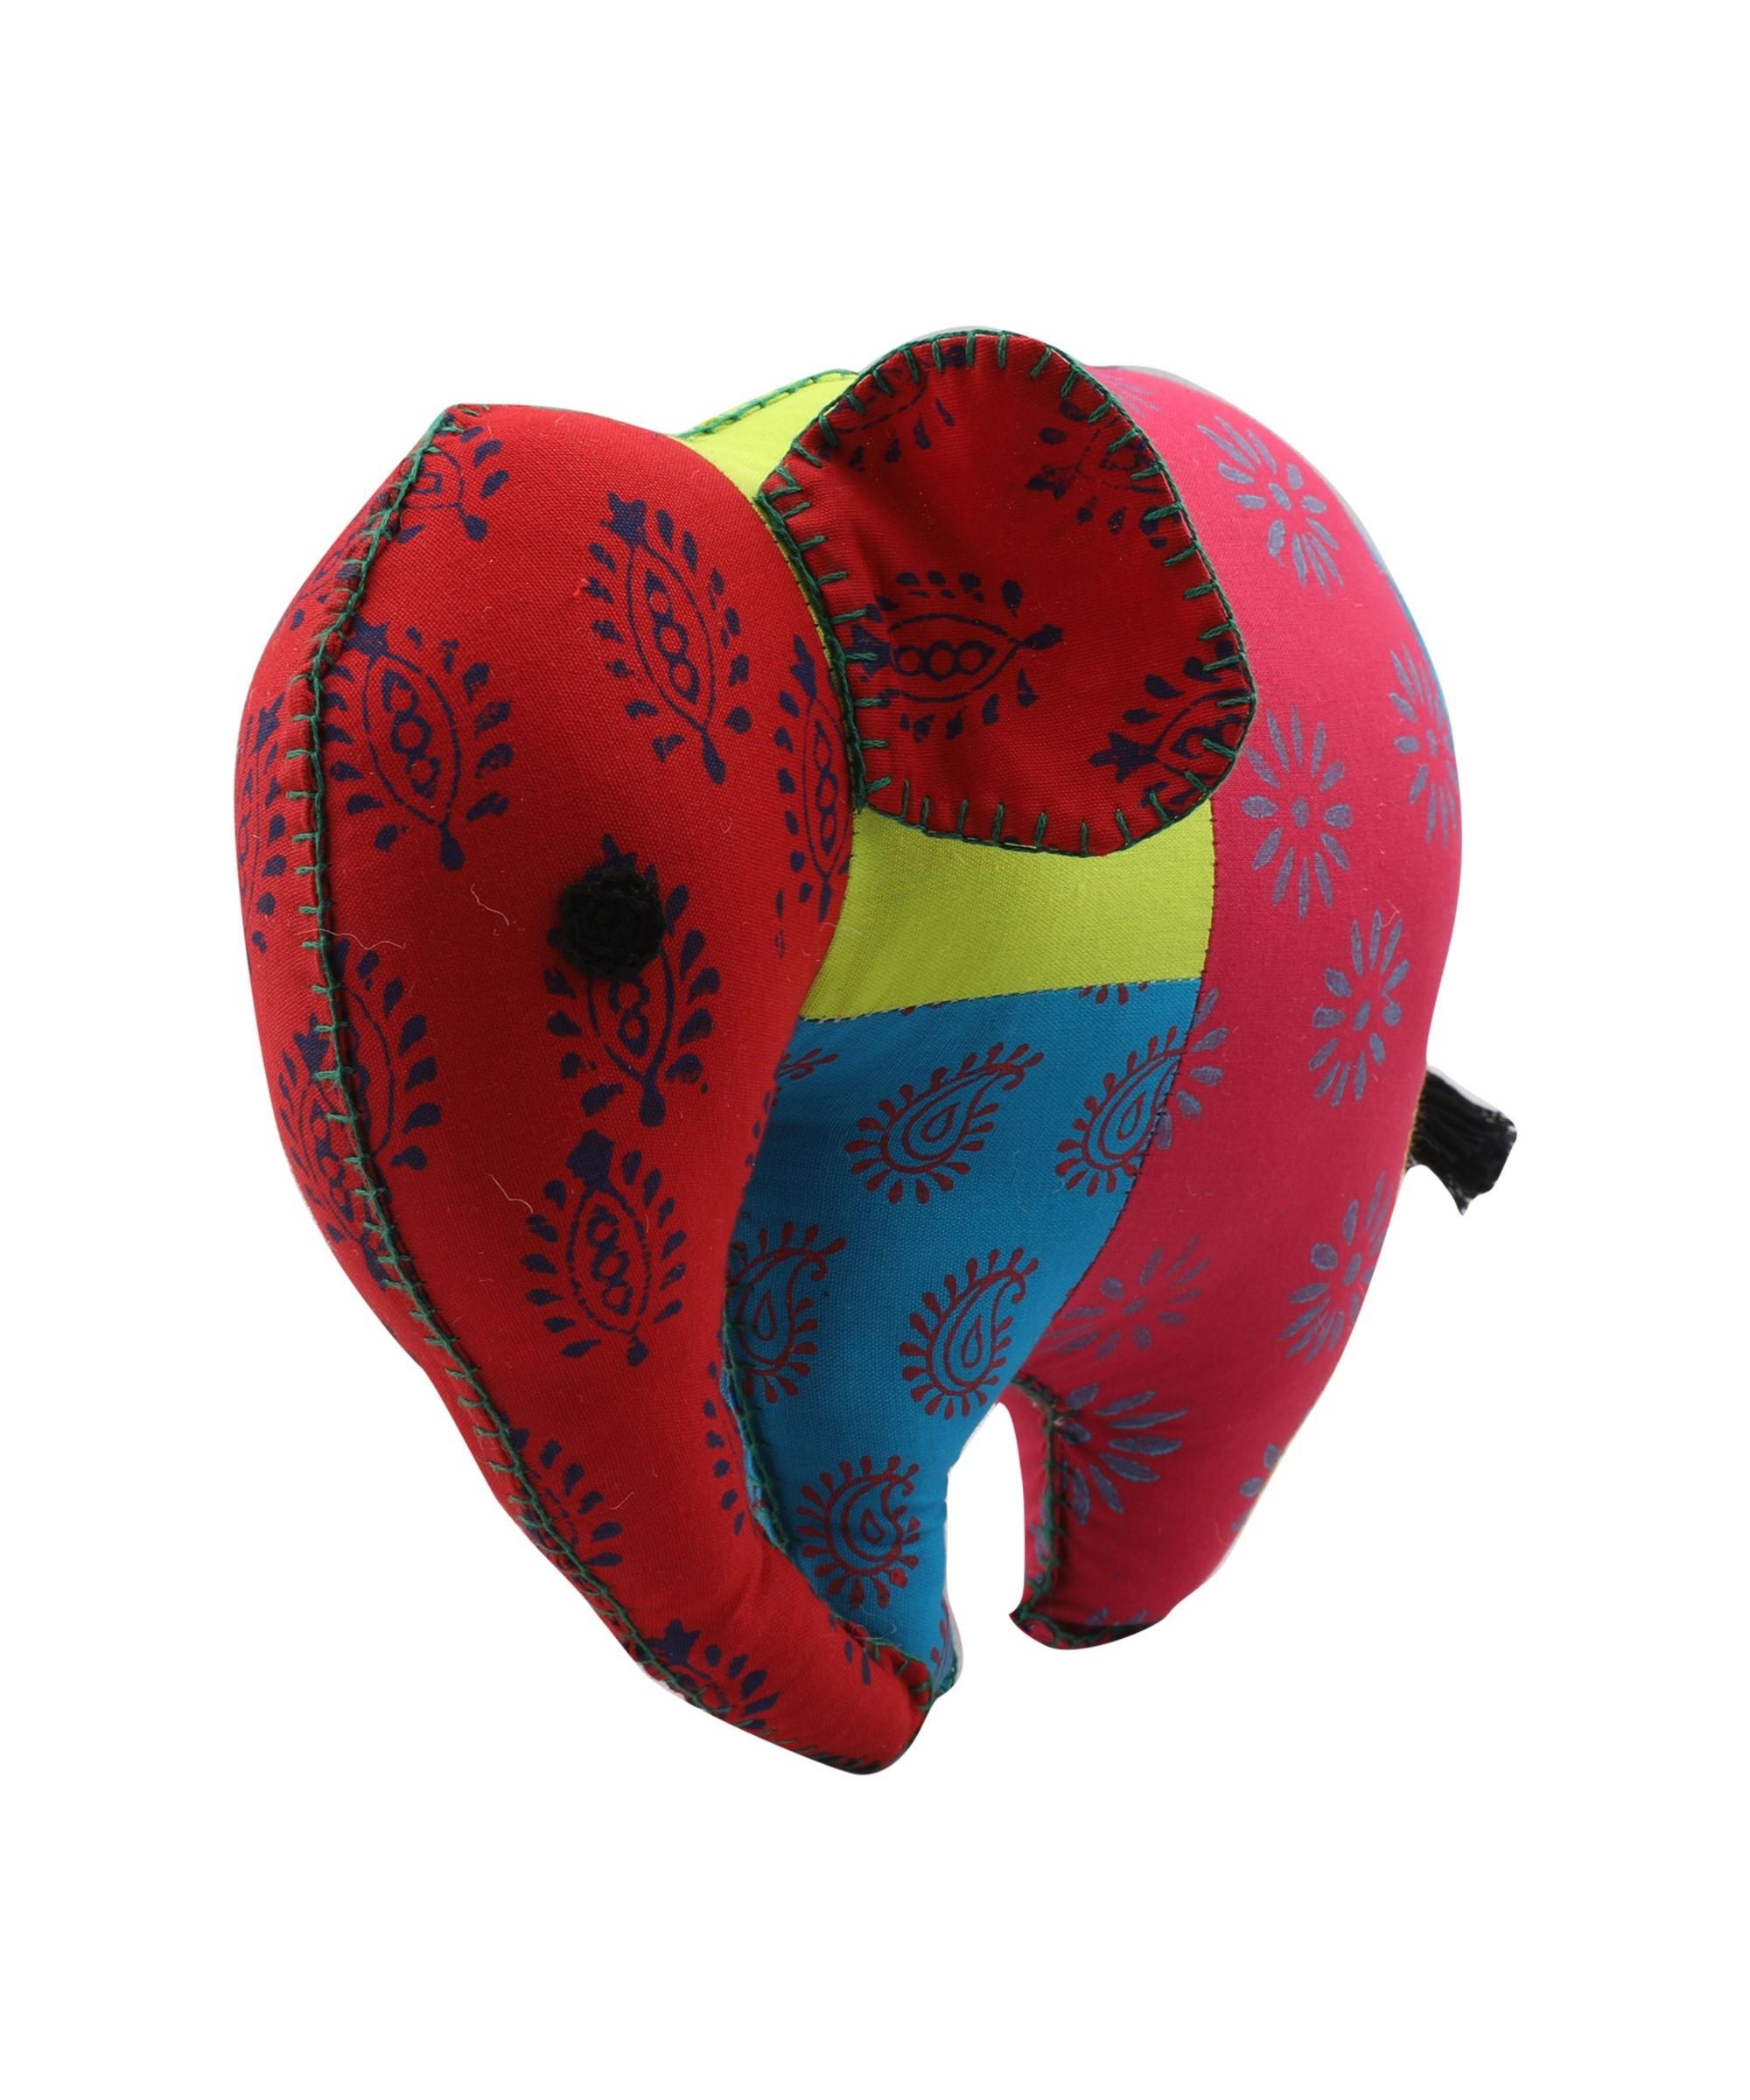 Elephant - Patchwork Soft Toy Slider 5/5